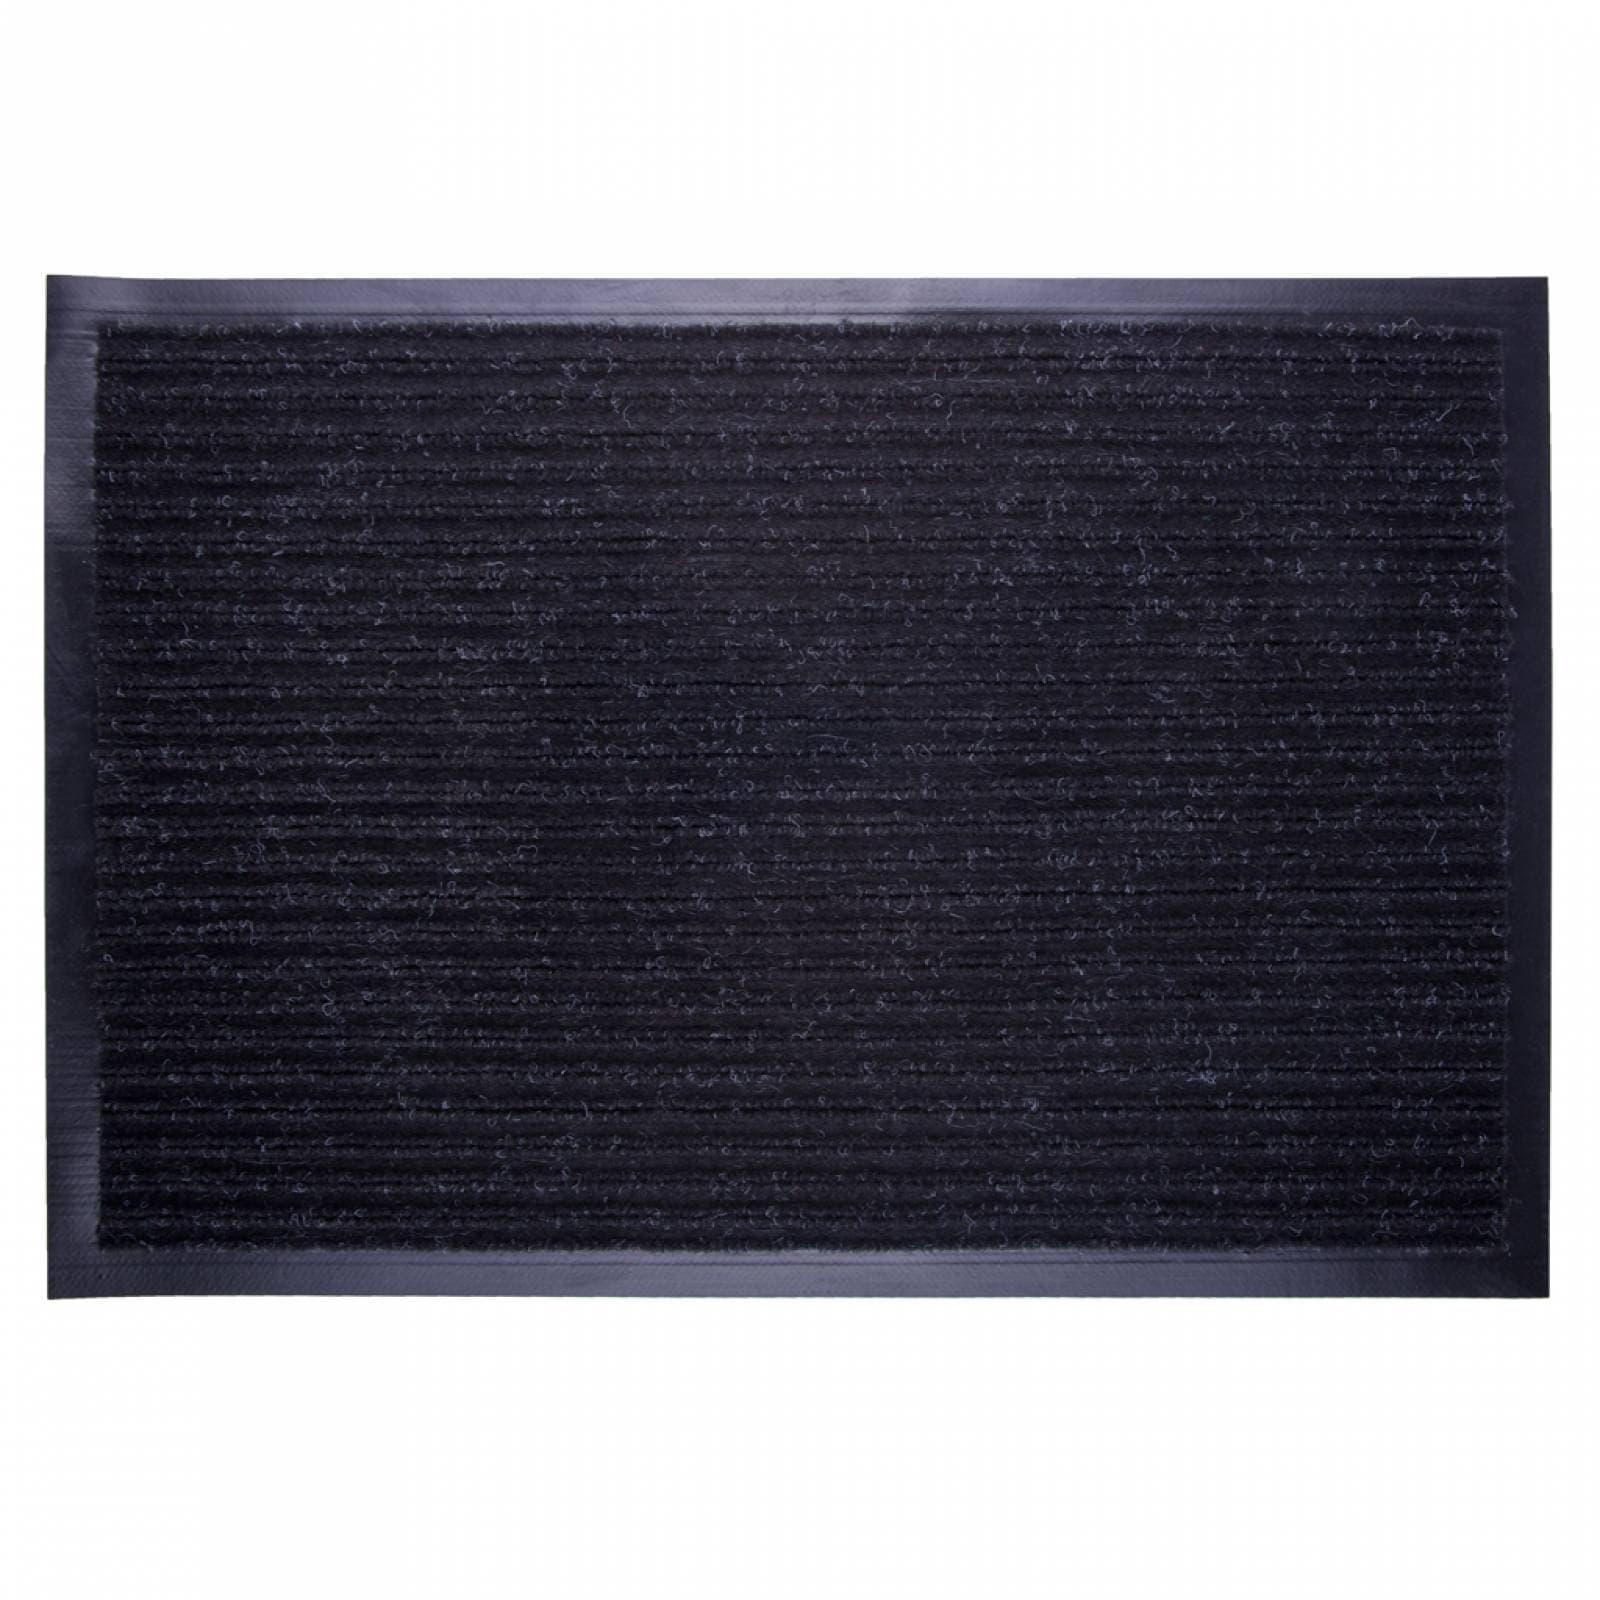 Tapete Si-Karai Duradero Antiderrapante Rayas 120x180c Negro